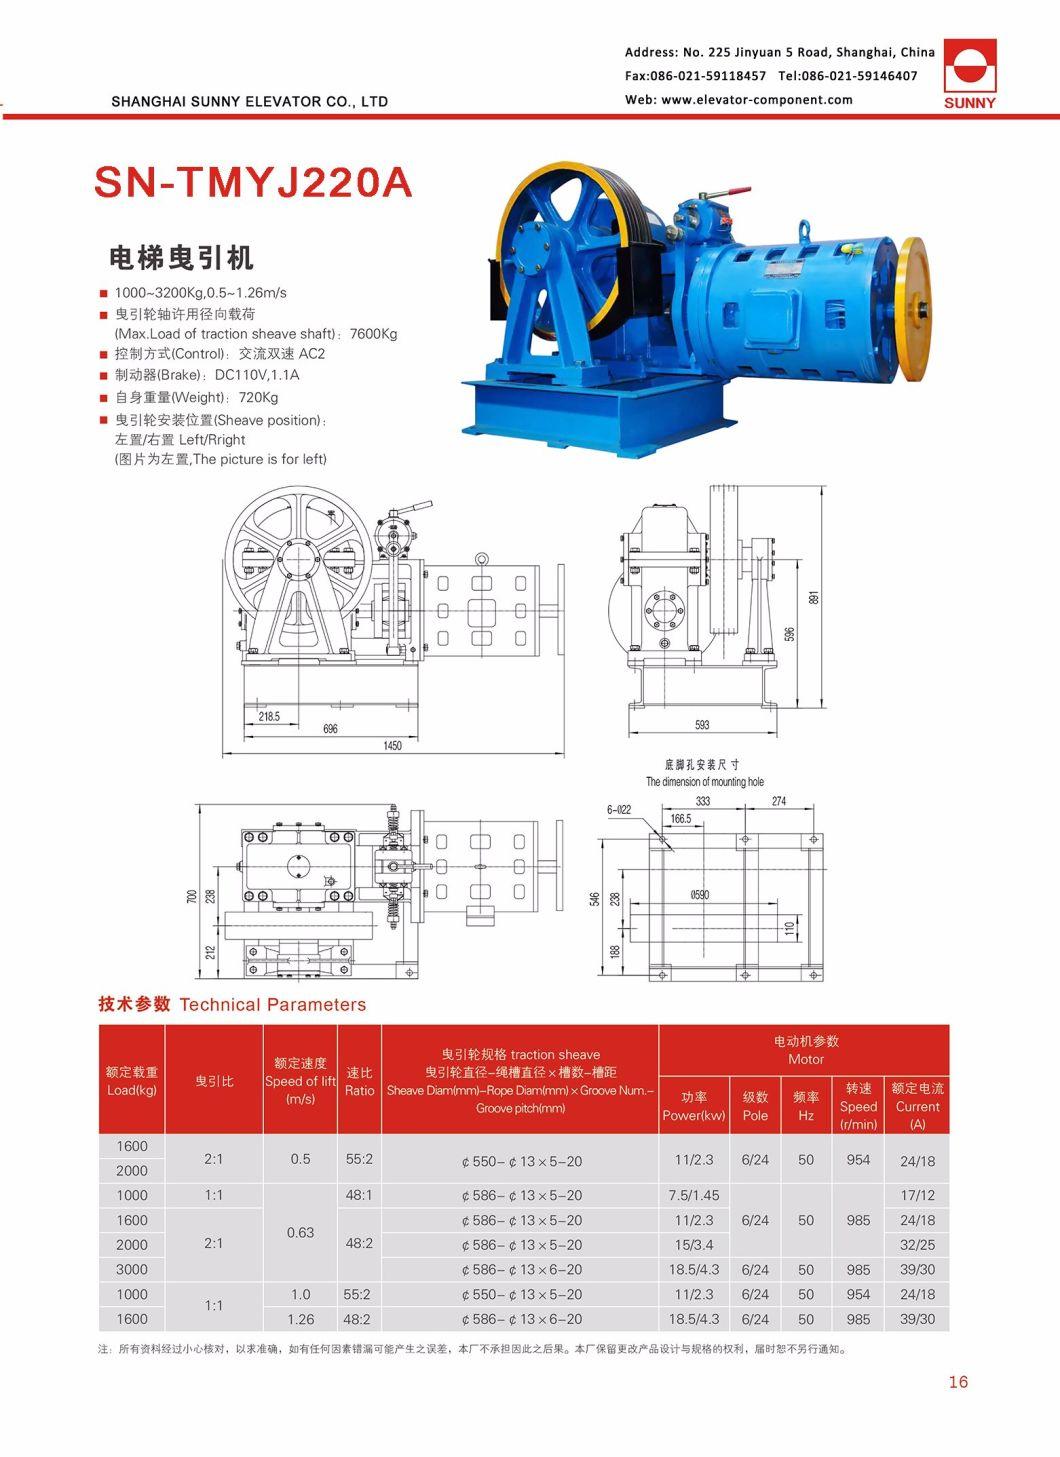 Elevator Geared Machine Sn-Yj220 (1000-2000KG, 1.0~1.5m/s)